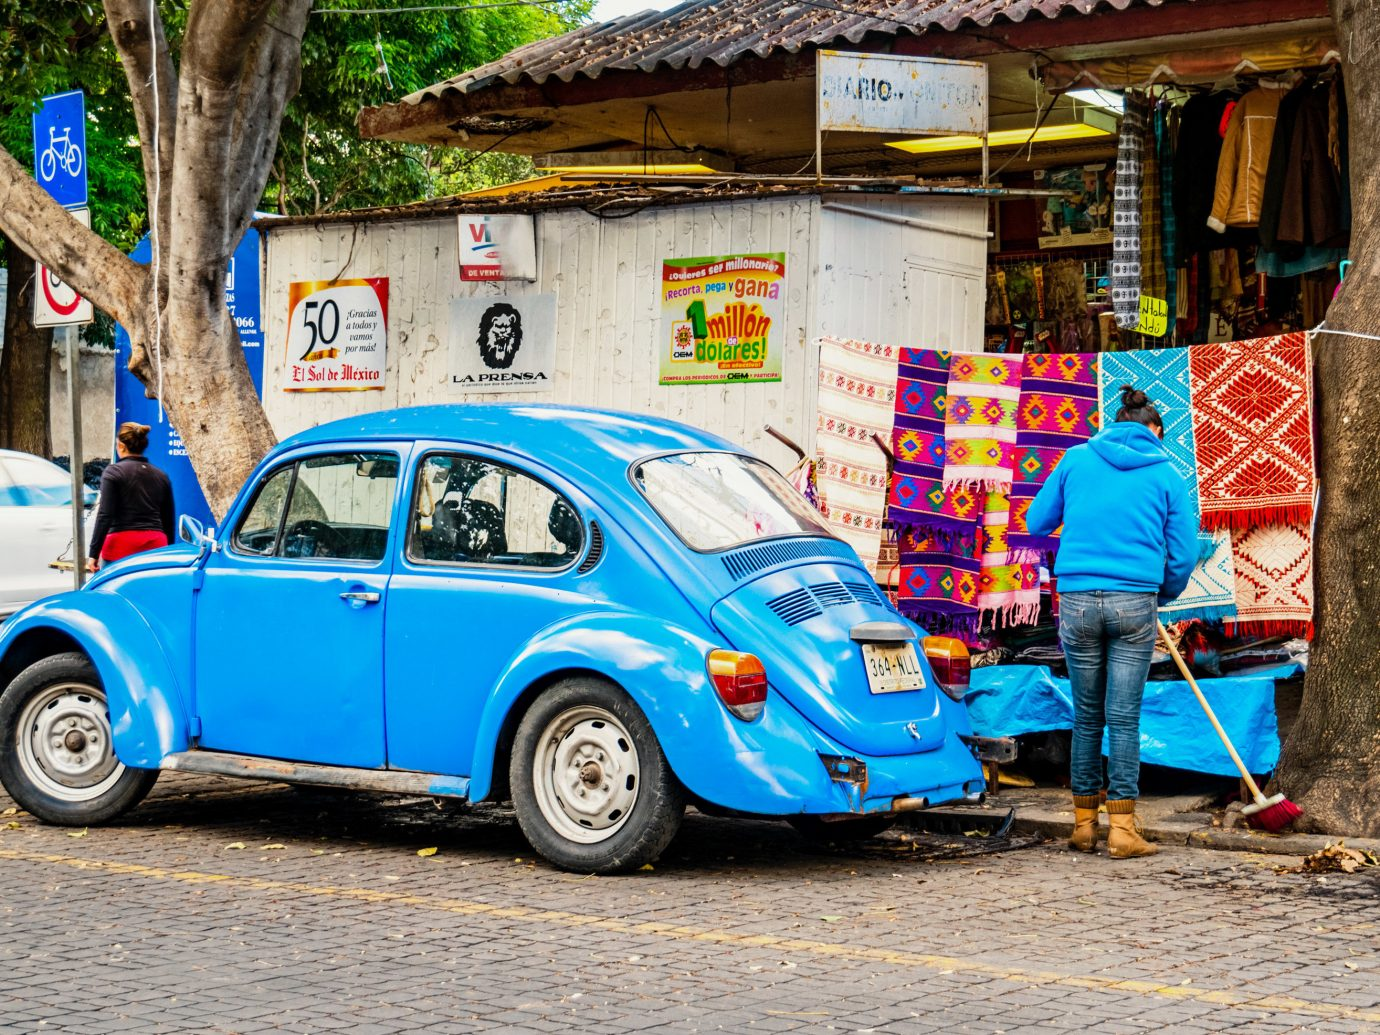 City Mexico City Trip Ideas outdoor building car motor vehicle vehicle volkswagen beetle automotive design Classic blue vintage car subcompact car street antique car parked compact car volkswagen automotive exterior